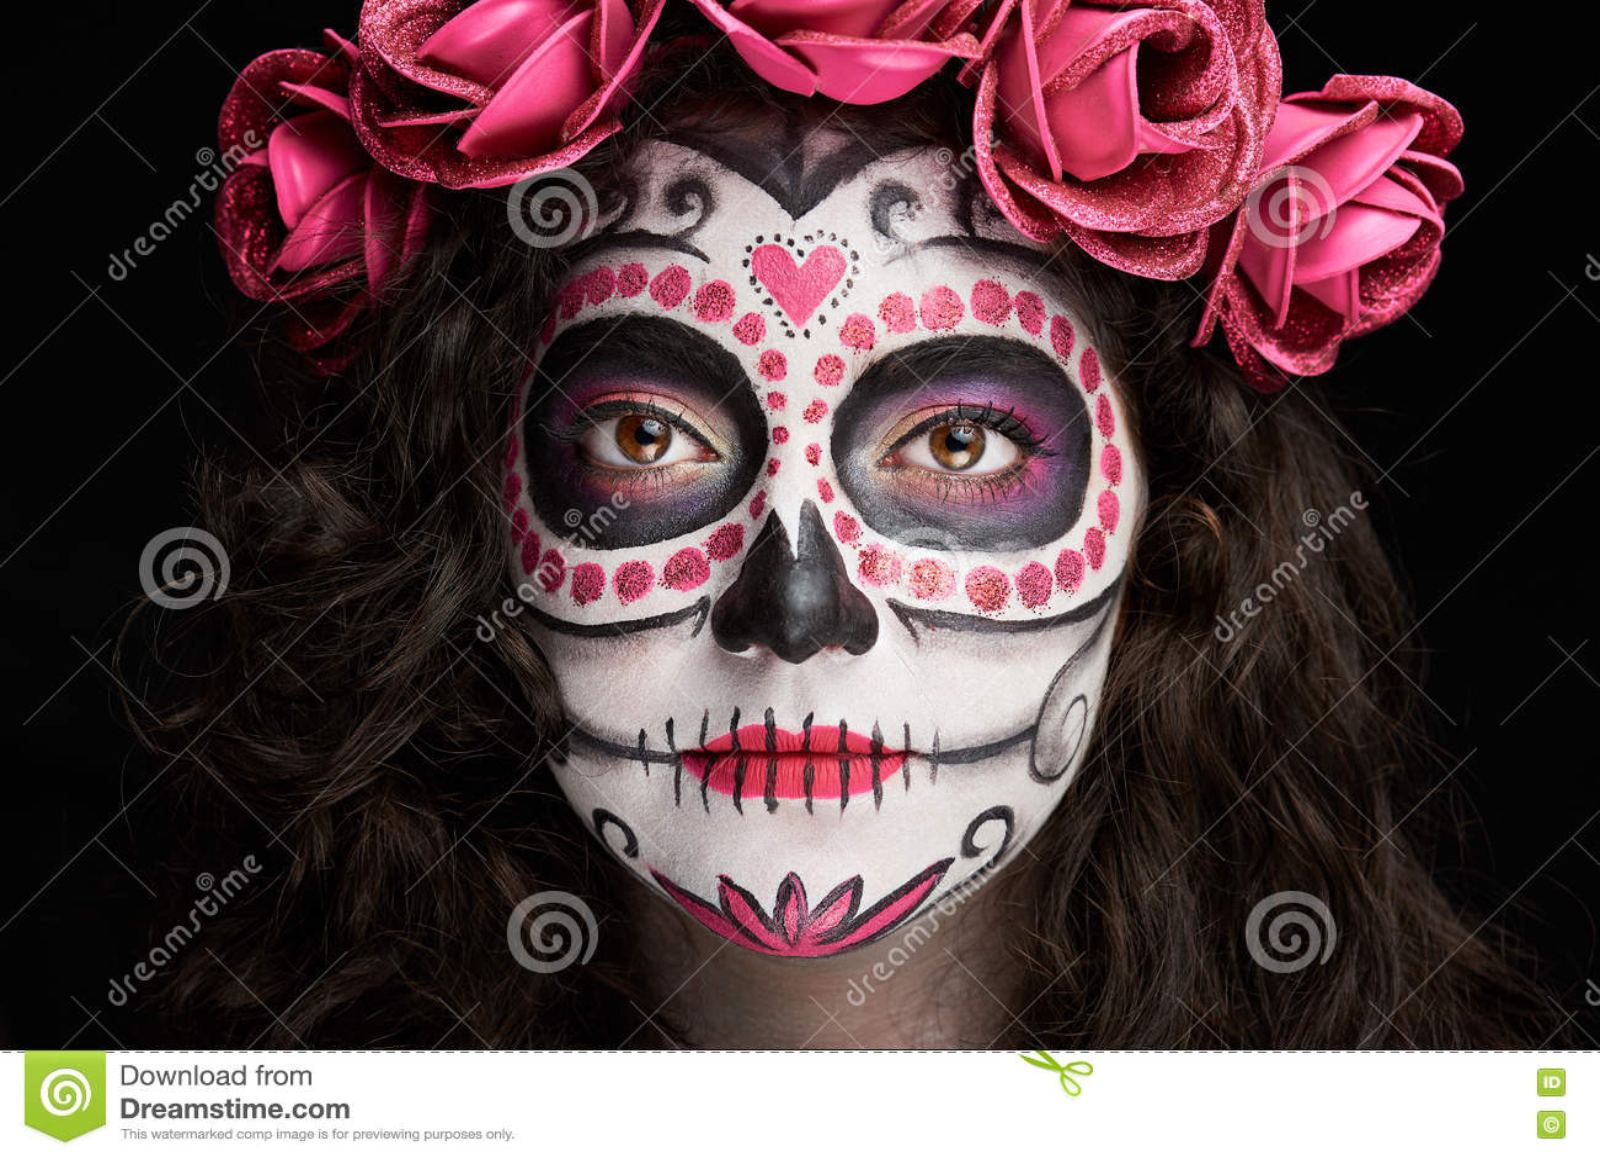 Maquillaje Craneo Caras Mexico Wwwmiifotoscom